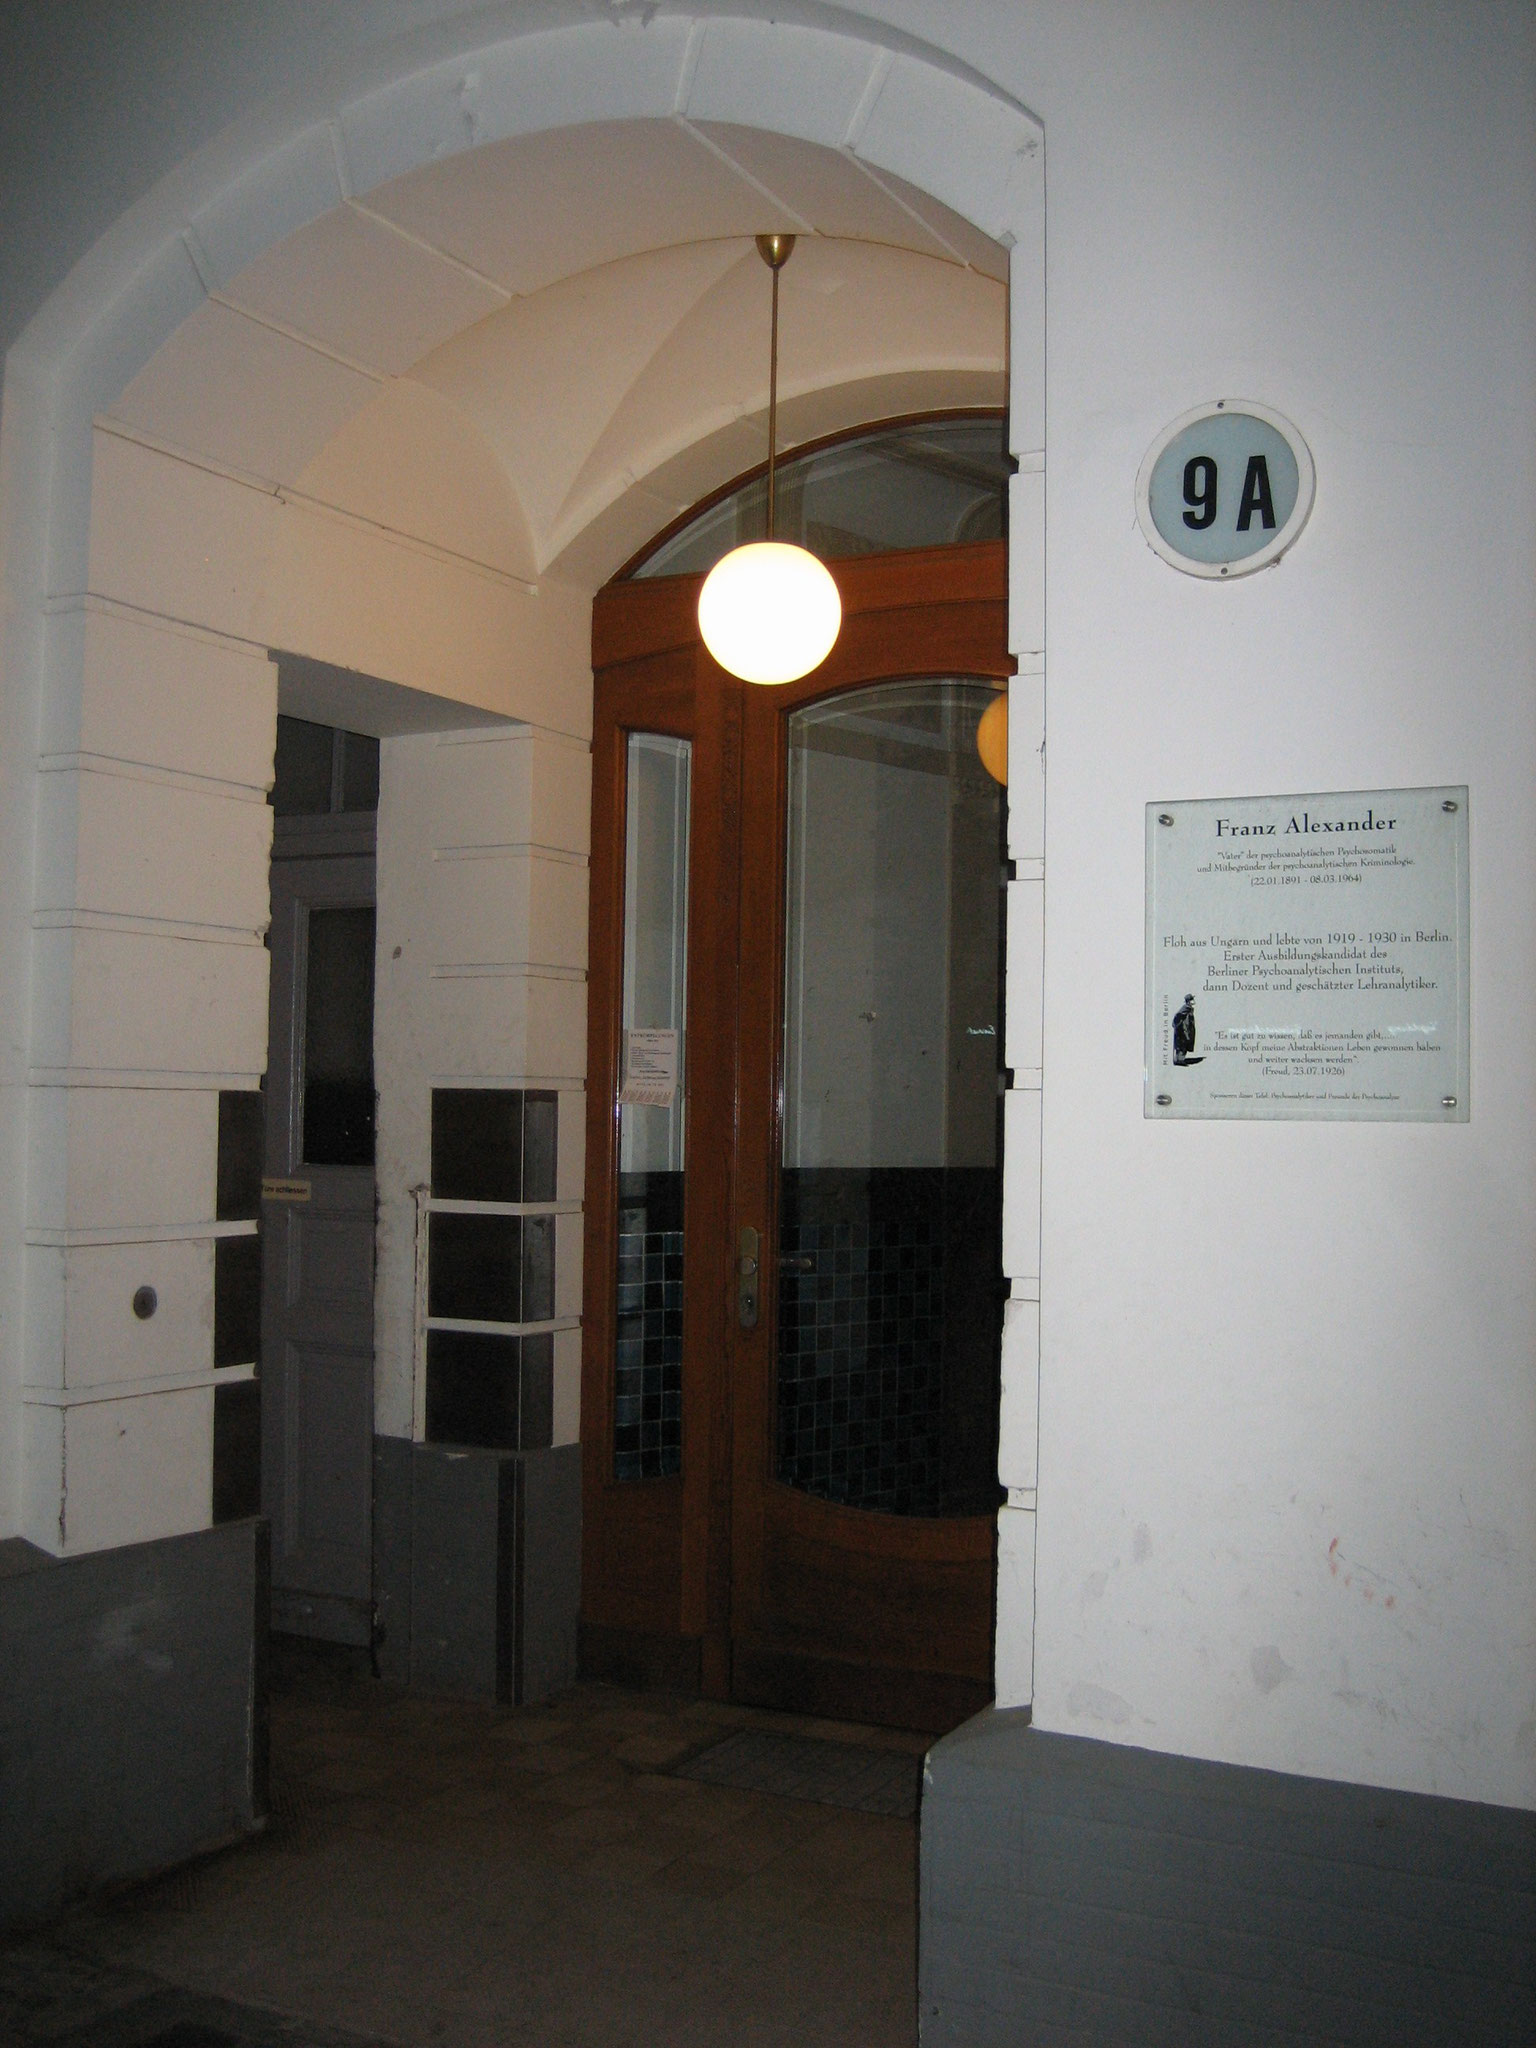 Ludwigkirchstr. 9a